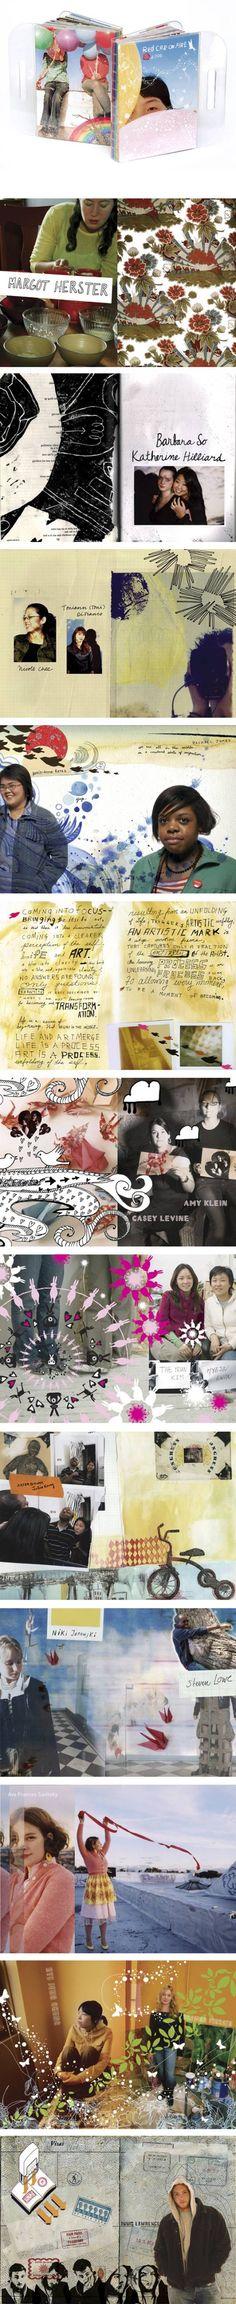 SVA yearbook / Six Sisters Design